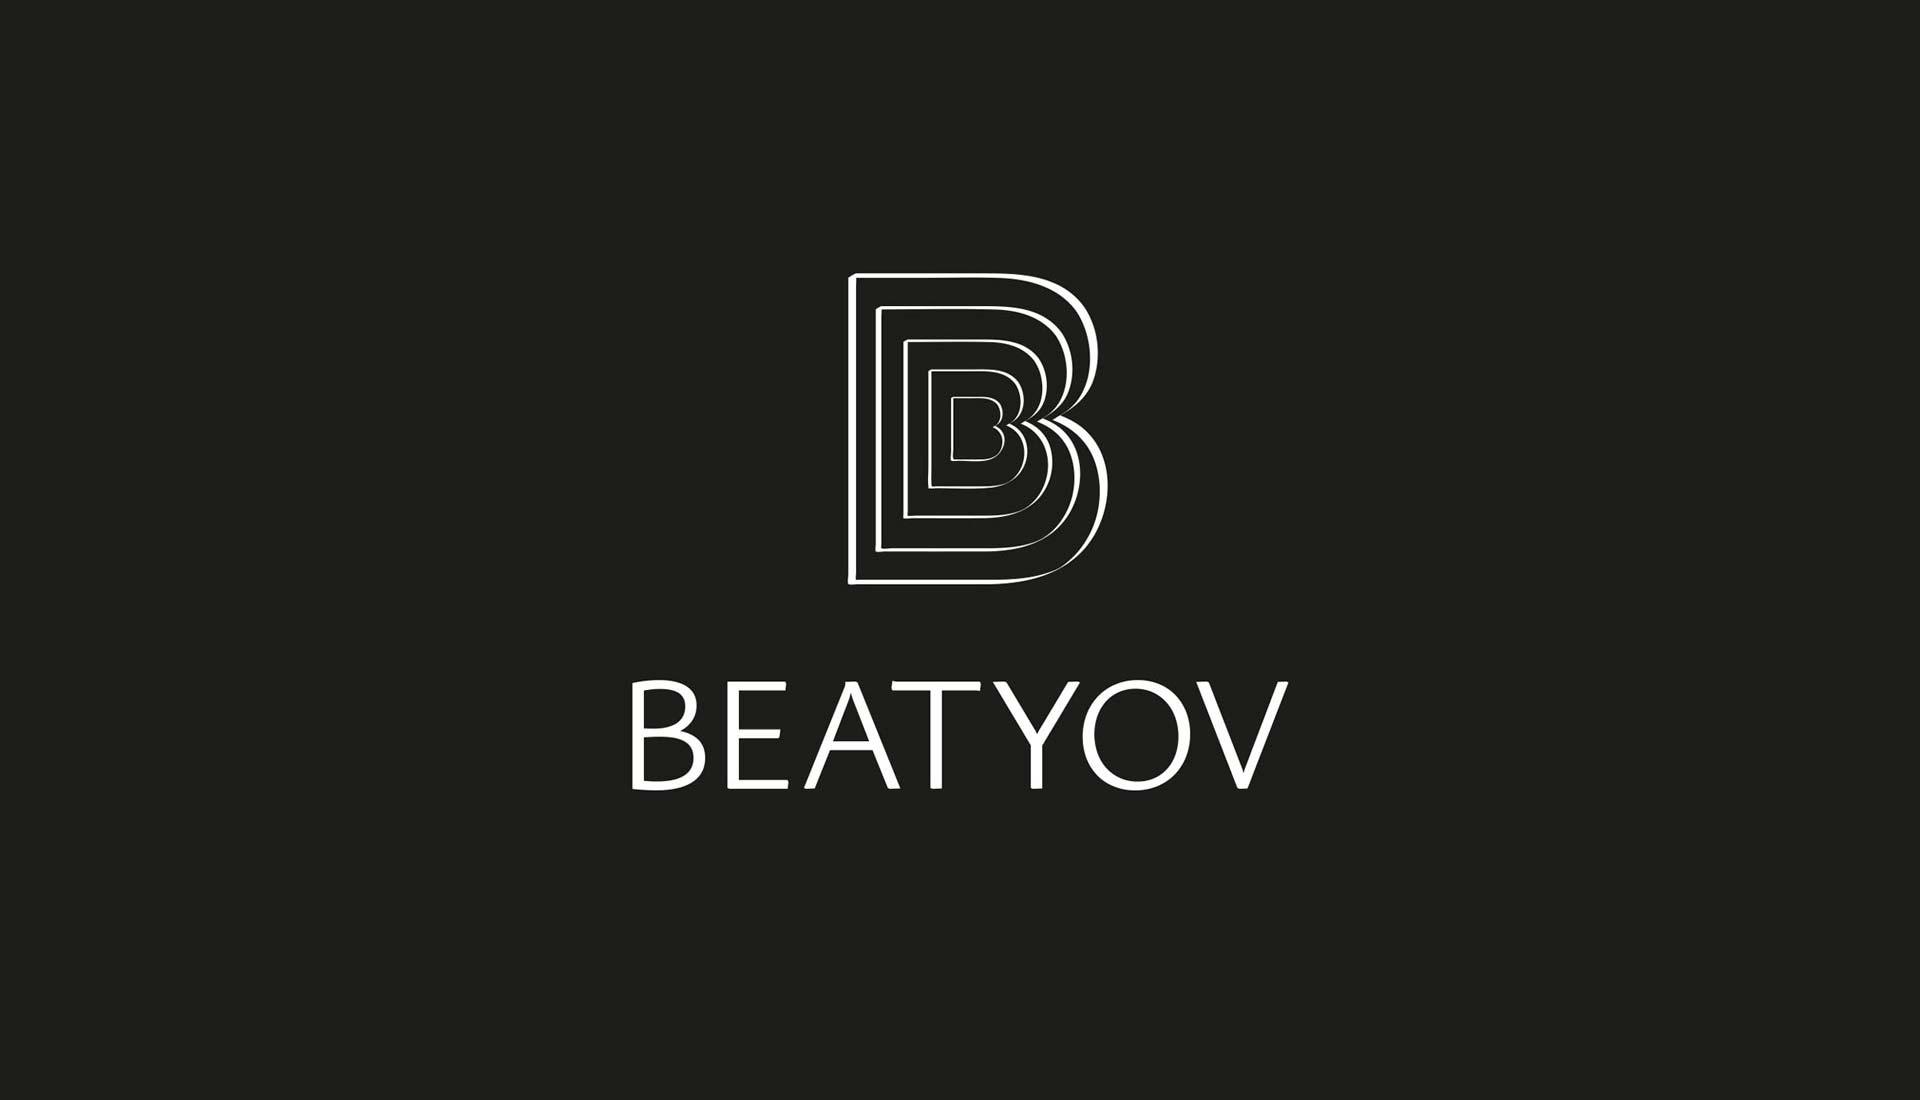 beatyov-logo